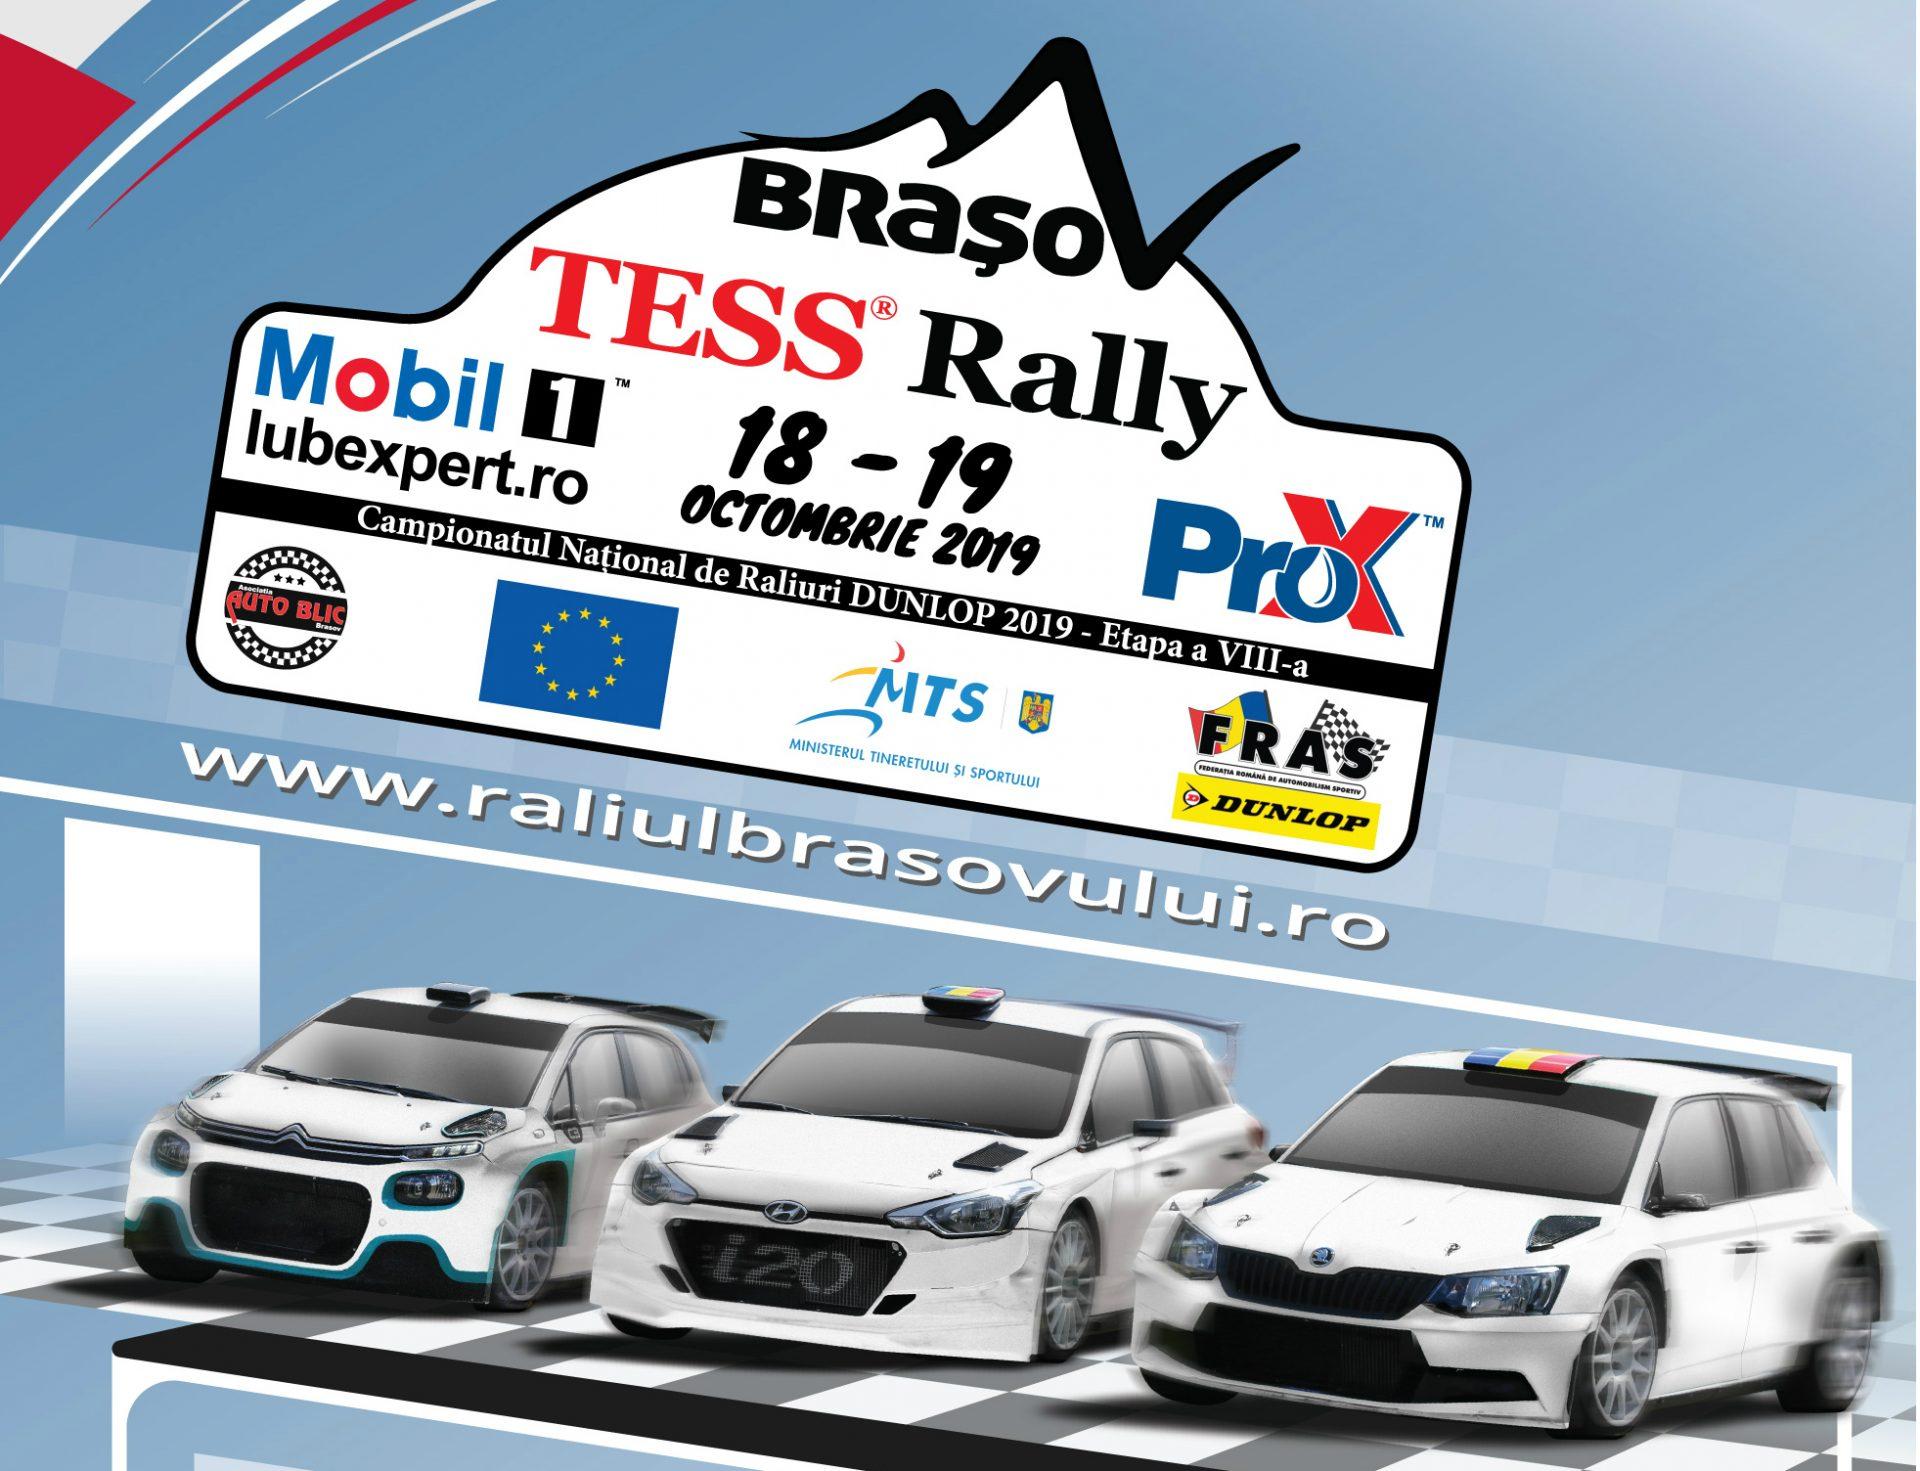 TESS Rally 48 – Finala se joaca la Brasov